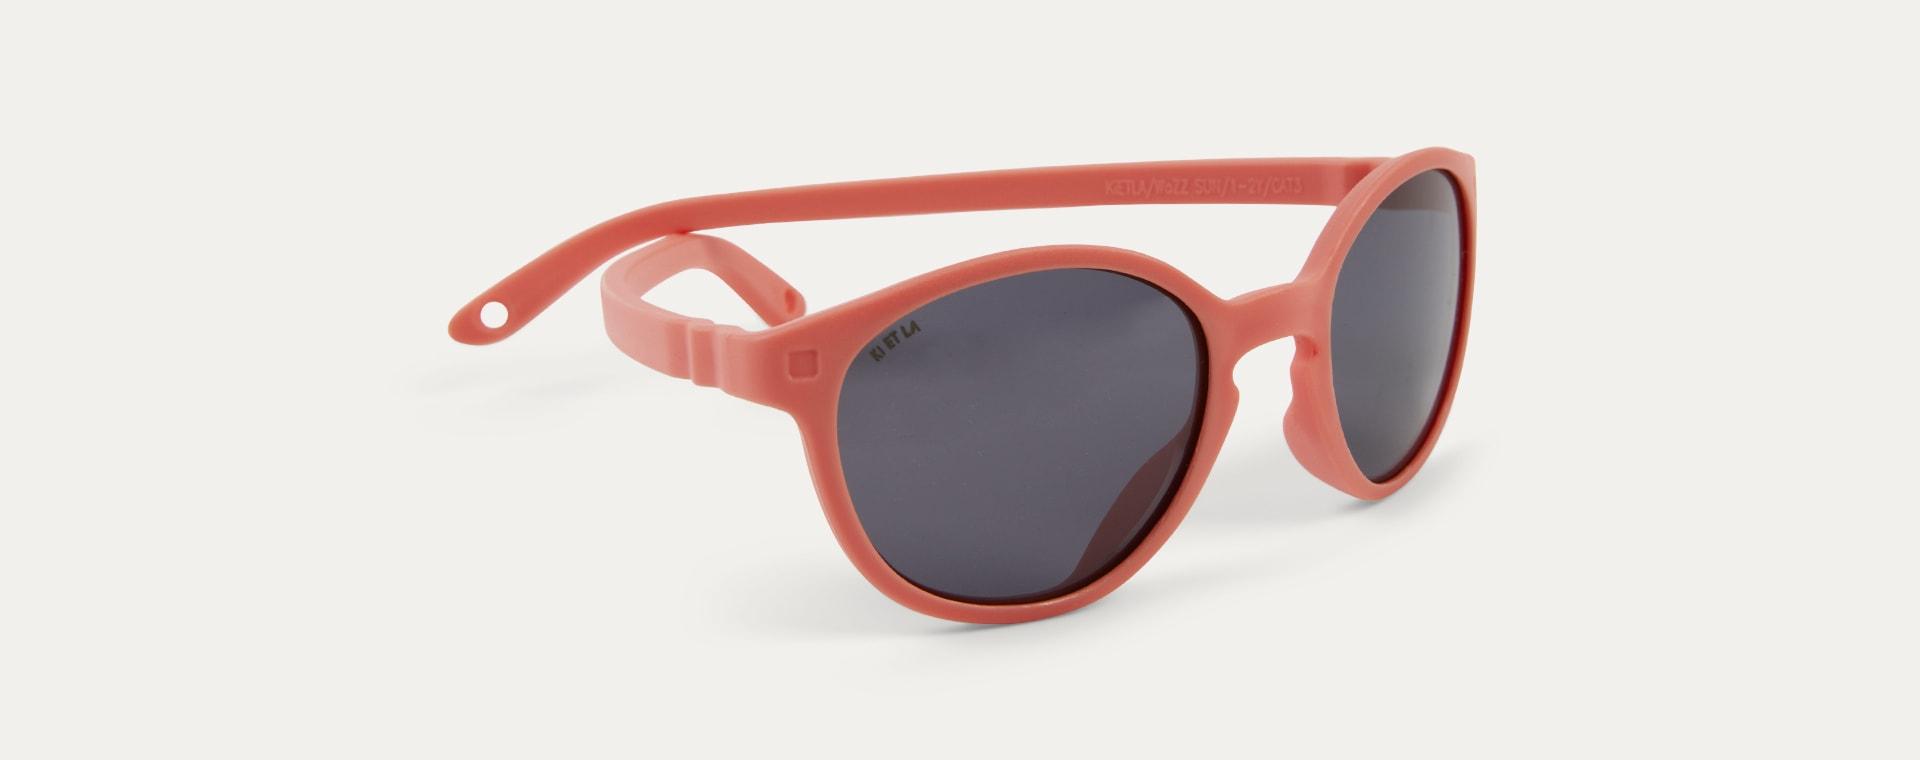 Grapefruit Ki ET LA WAZZ Wayfarer Sunglasses